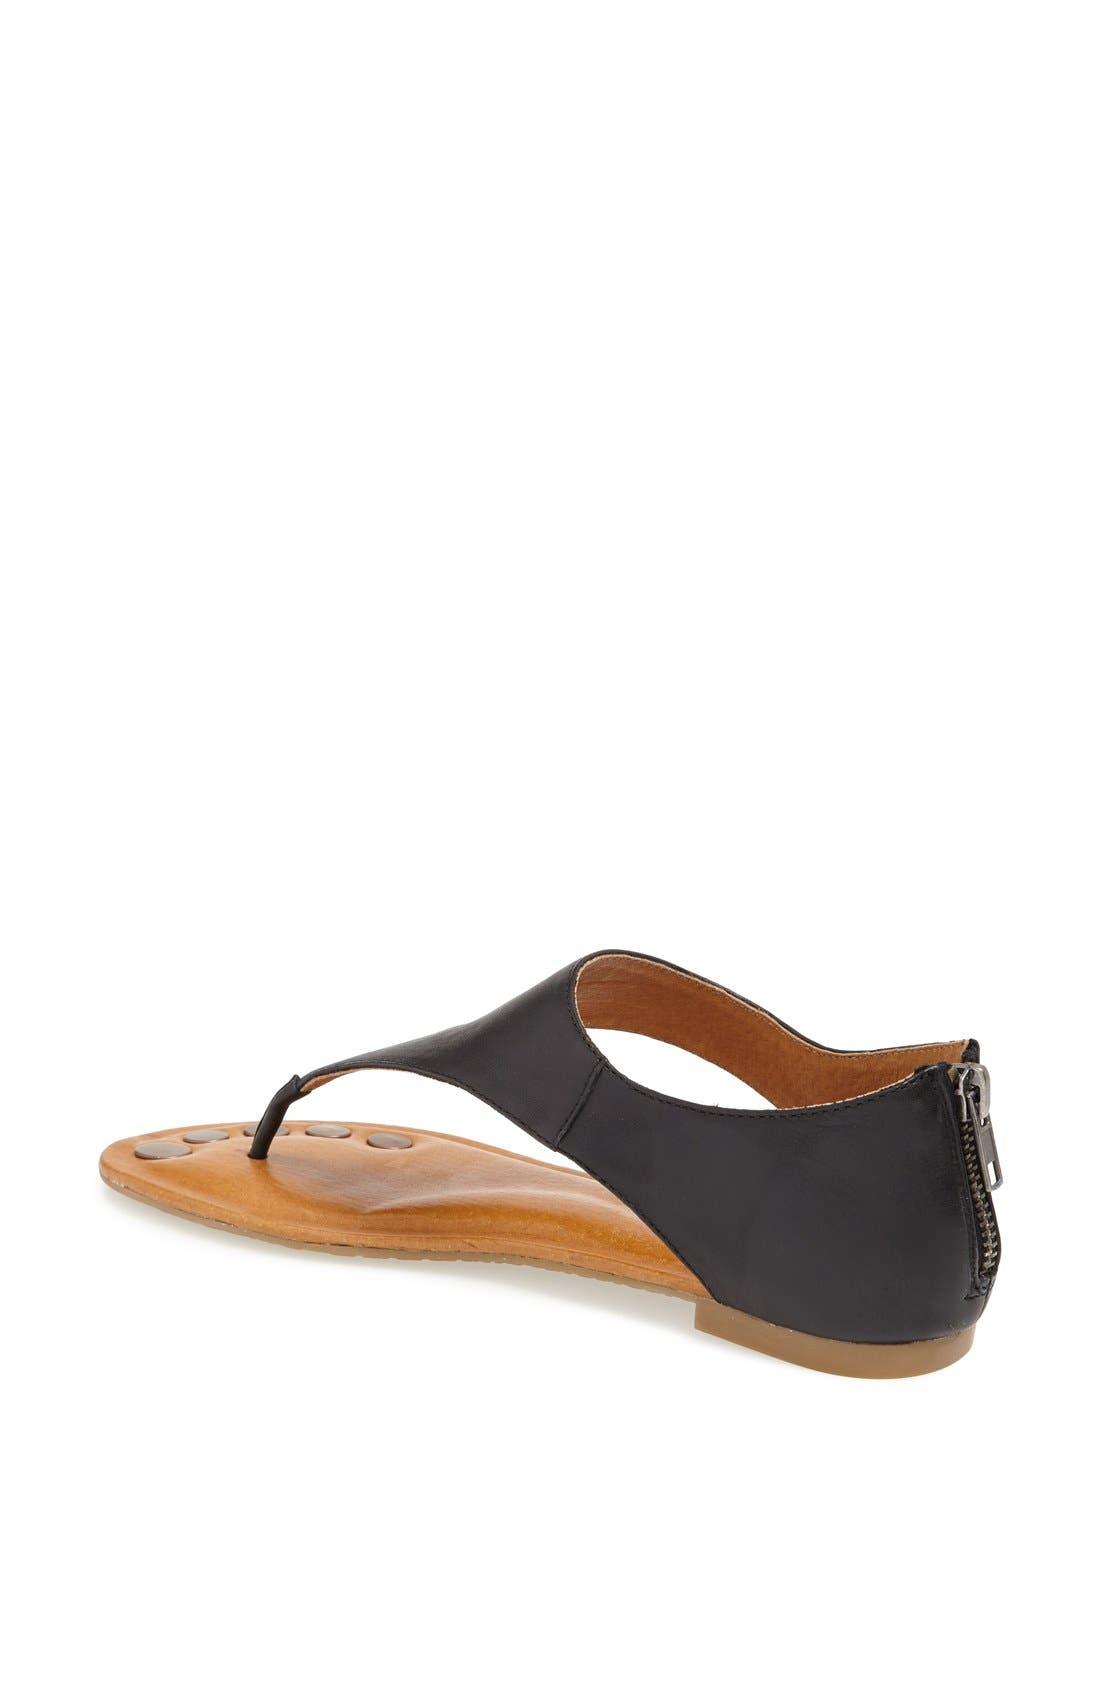 'Luna' Metallic Leather Thong Sandal,                             Alternate thumbnail 2, color,                             010